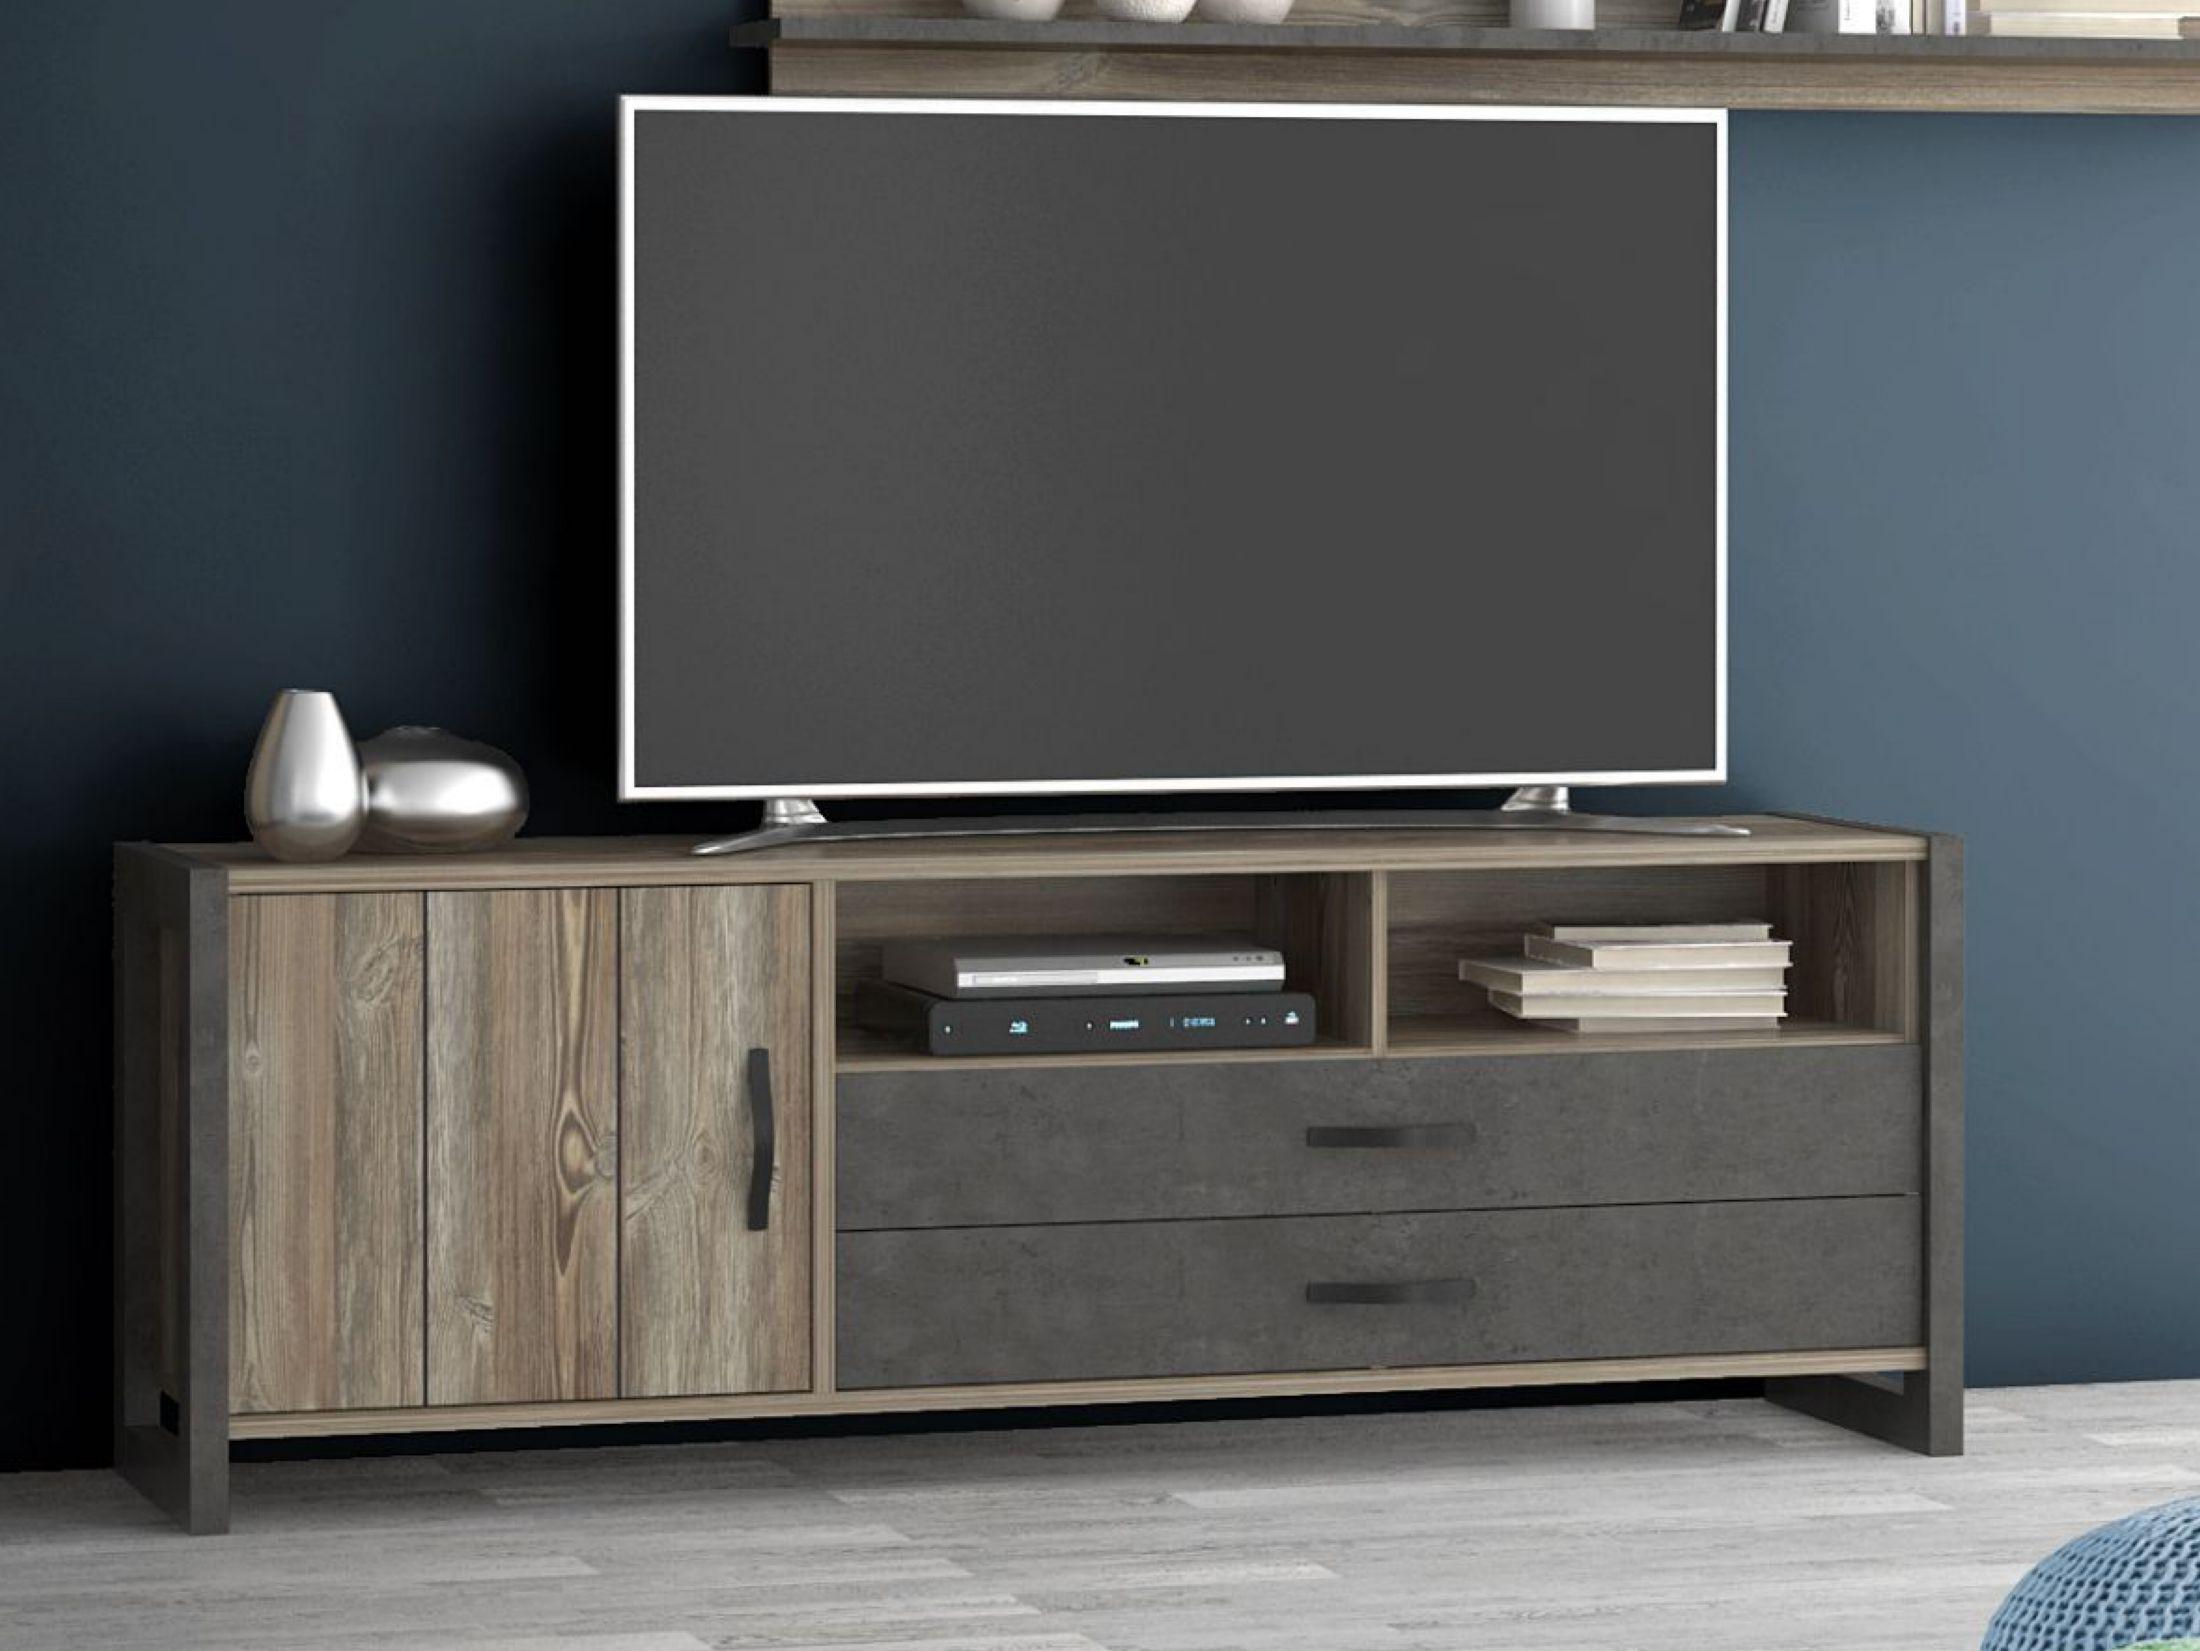 Tv Unterschrank In Grau Kiefer Forte M–bel Note Holzwerkstoffe